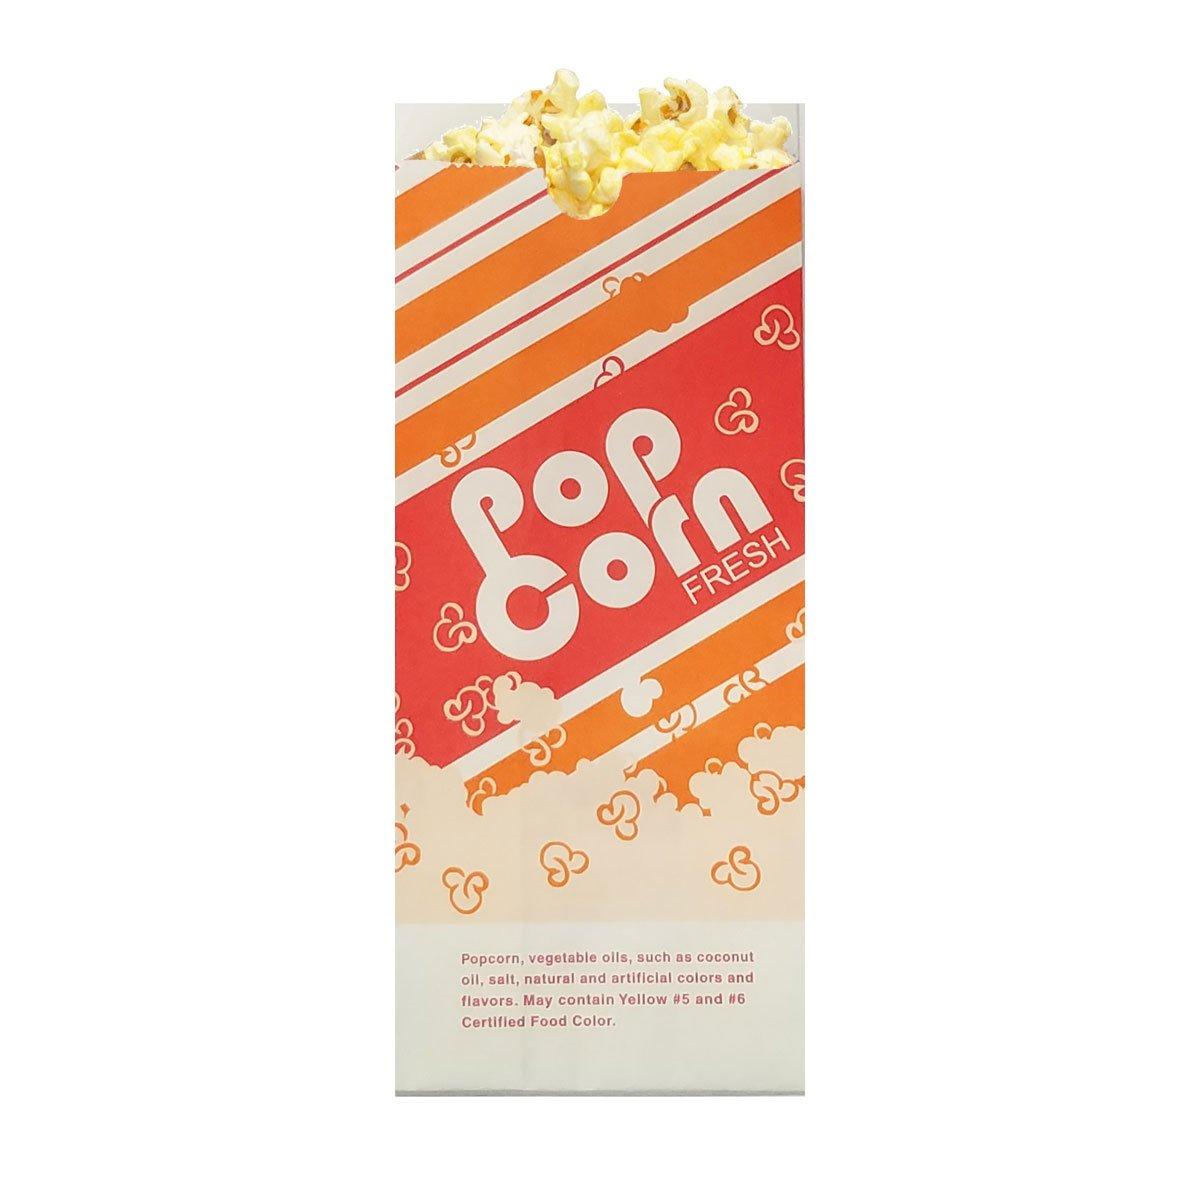 Hoosier Hill Farm Popcorn Bags (8) - 100 Count HHF15